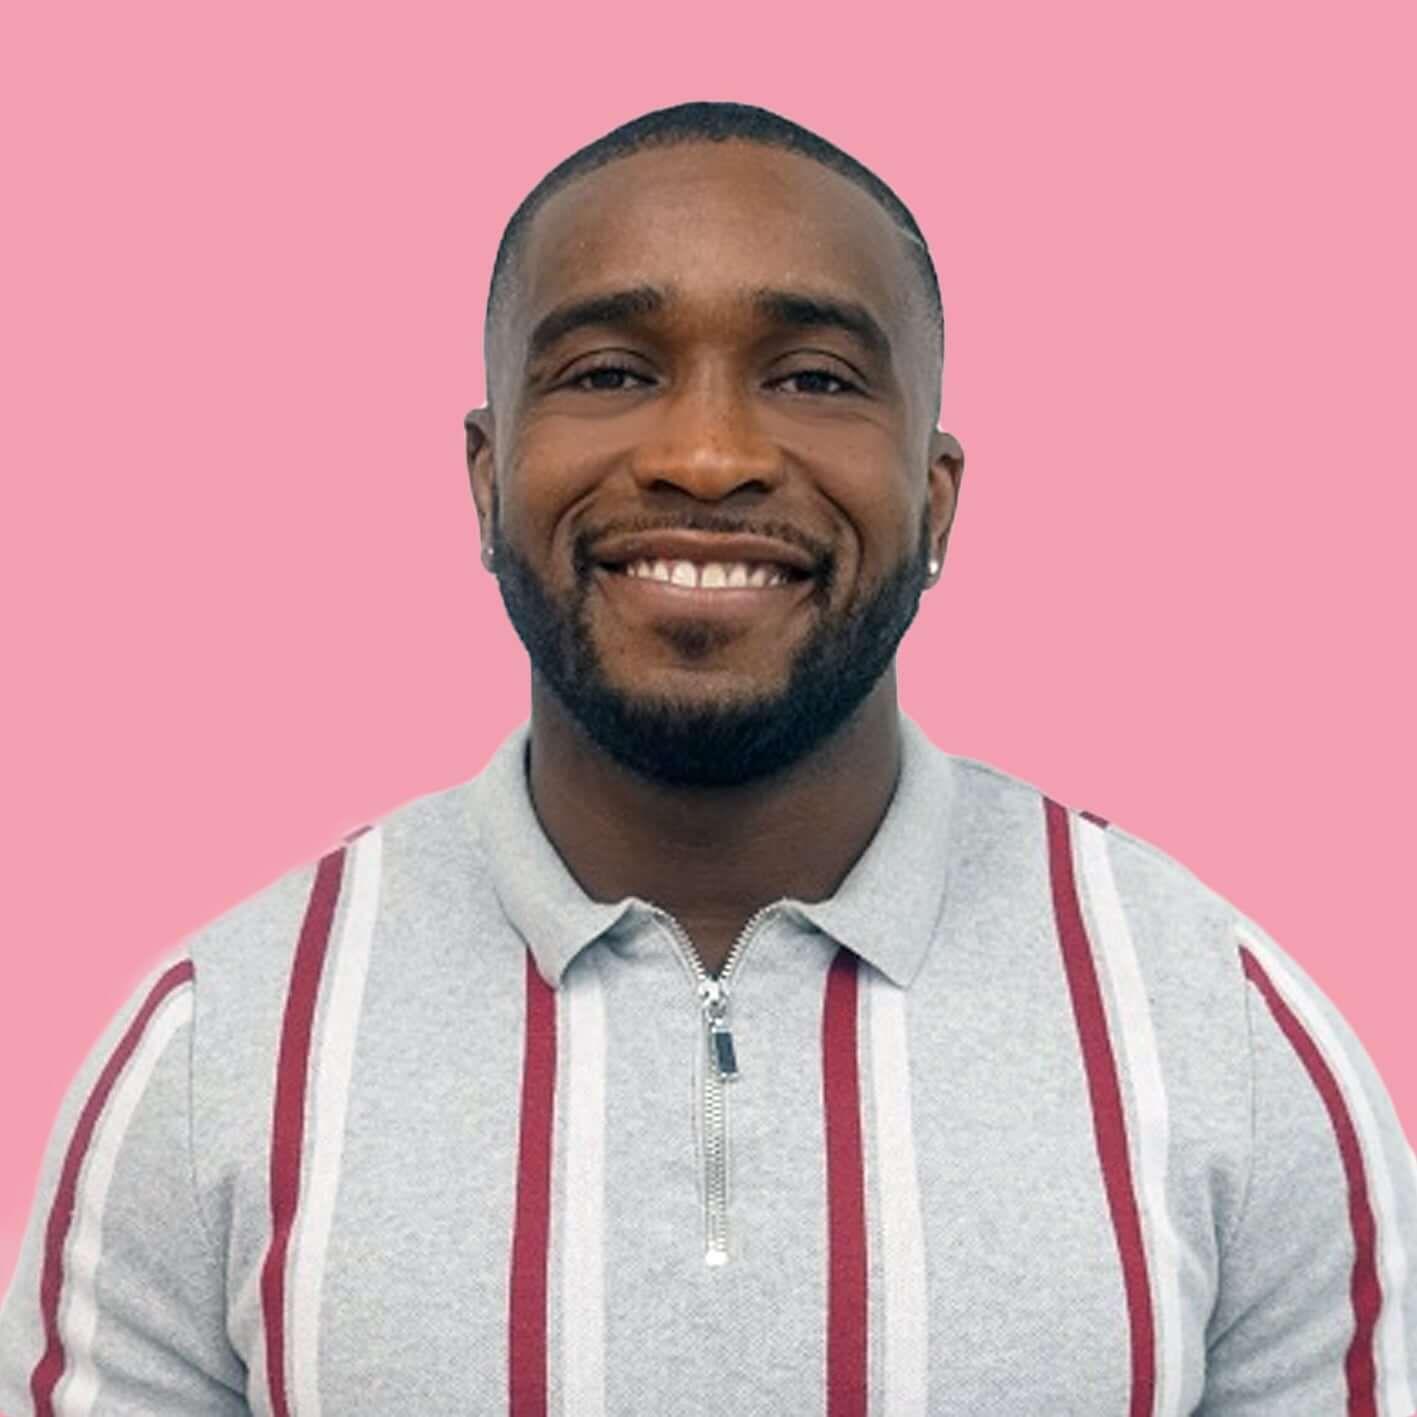 Isaac Okeowo